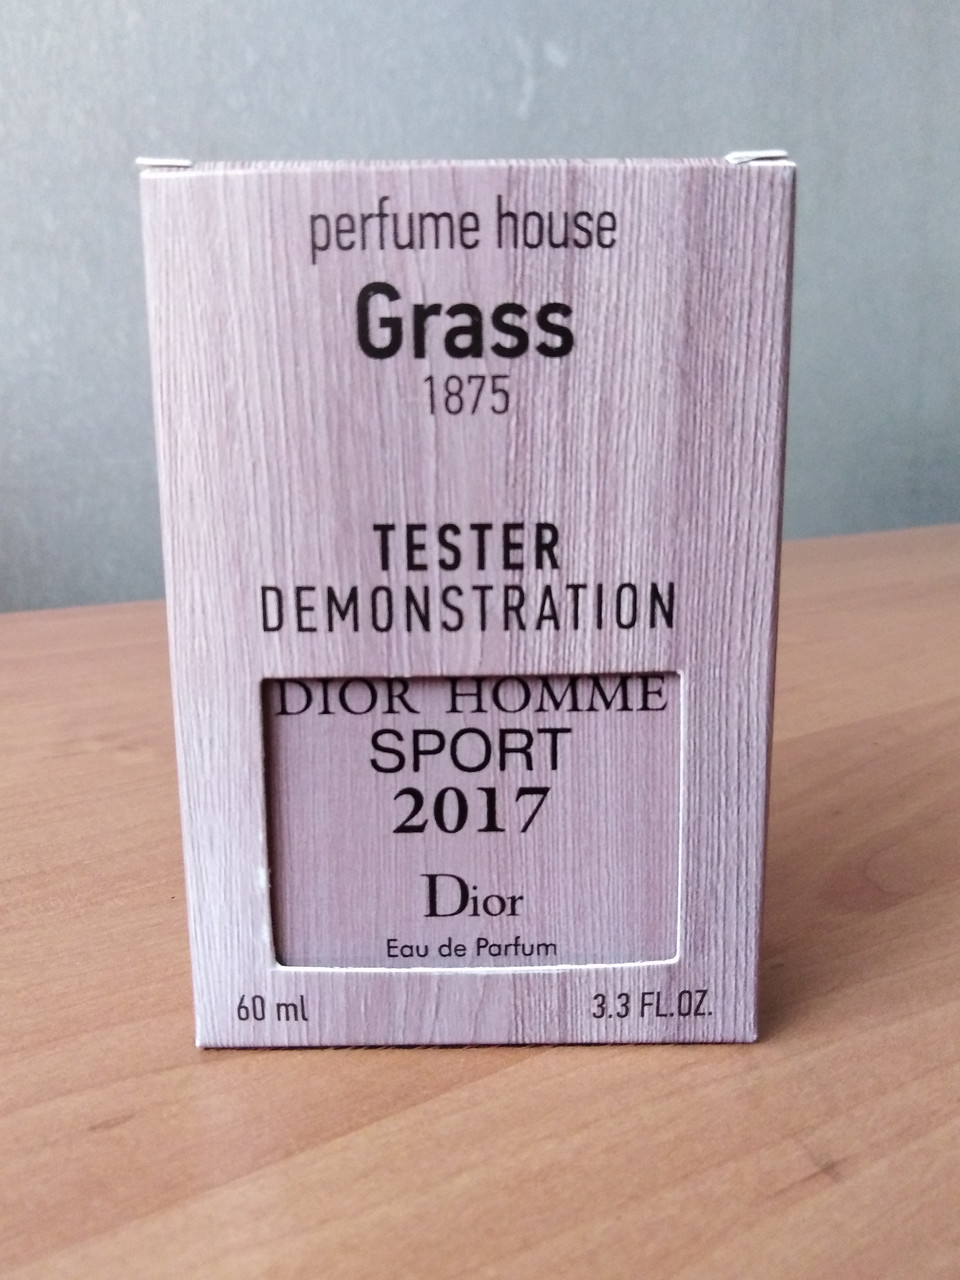 Мужская туалетная вода Dior Homme Sport 2017 (диор хомм спорт) в тестере 60 мл (реплика)